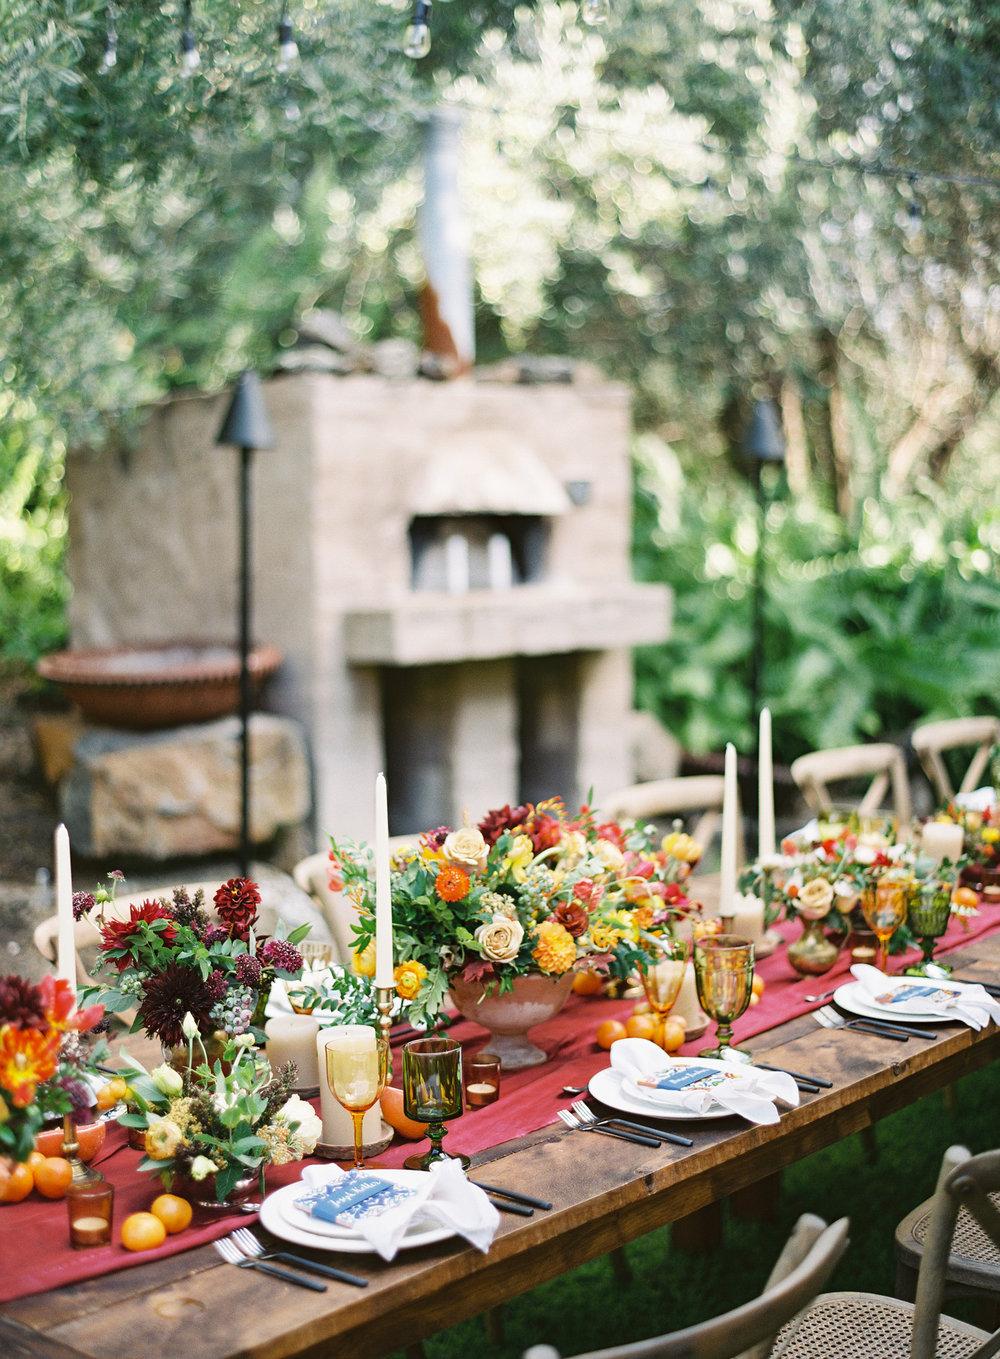 signature-maui-equipment-rentals-decor-for-weddings-in-maui-hawaii 2.jpg